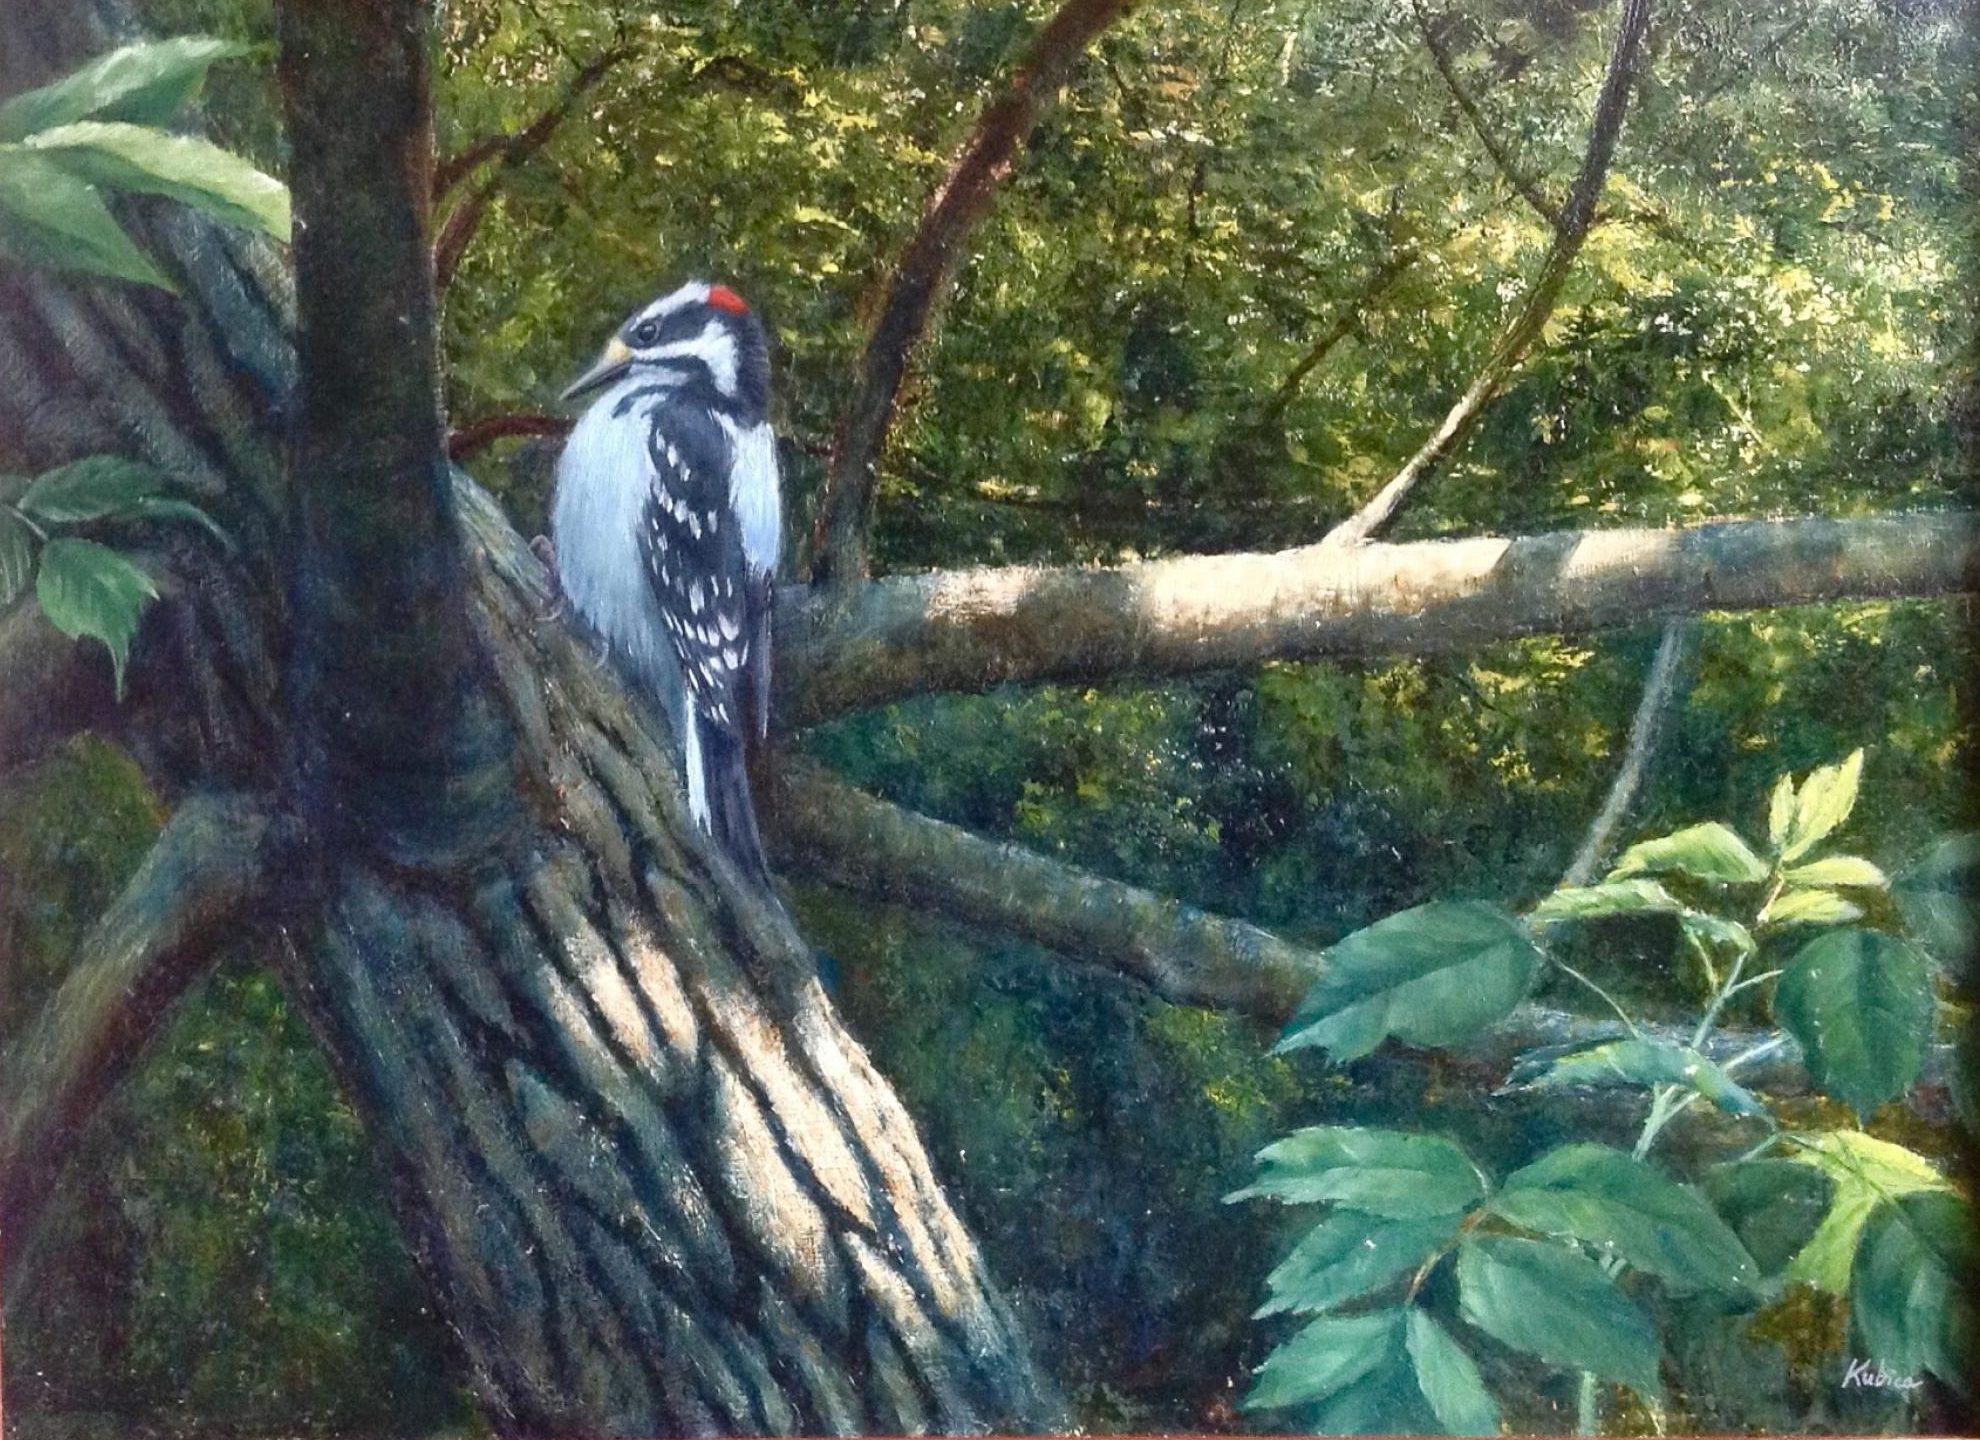 Shady Grove - Hairy Woodpecker by Robert Kubica